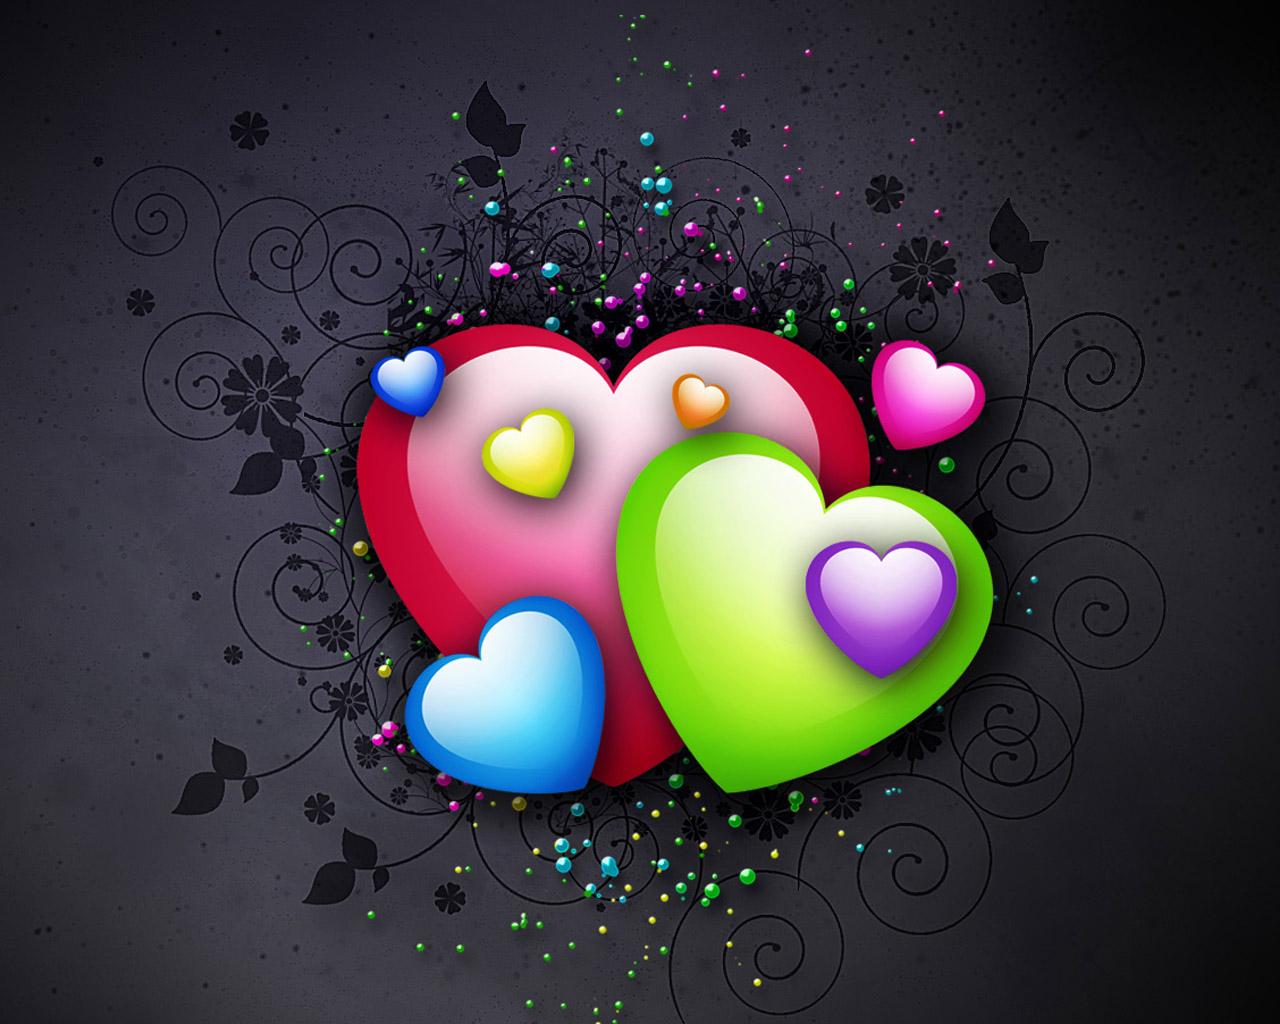 http://4.bp.blogspot.com/-6PorWNEAJvs/Tg02OWTabRI/AAAAAAAAC7o/6NN3q1OBr2c/s1600/coloured-hearts-wallpapers.jpg